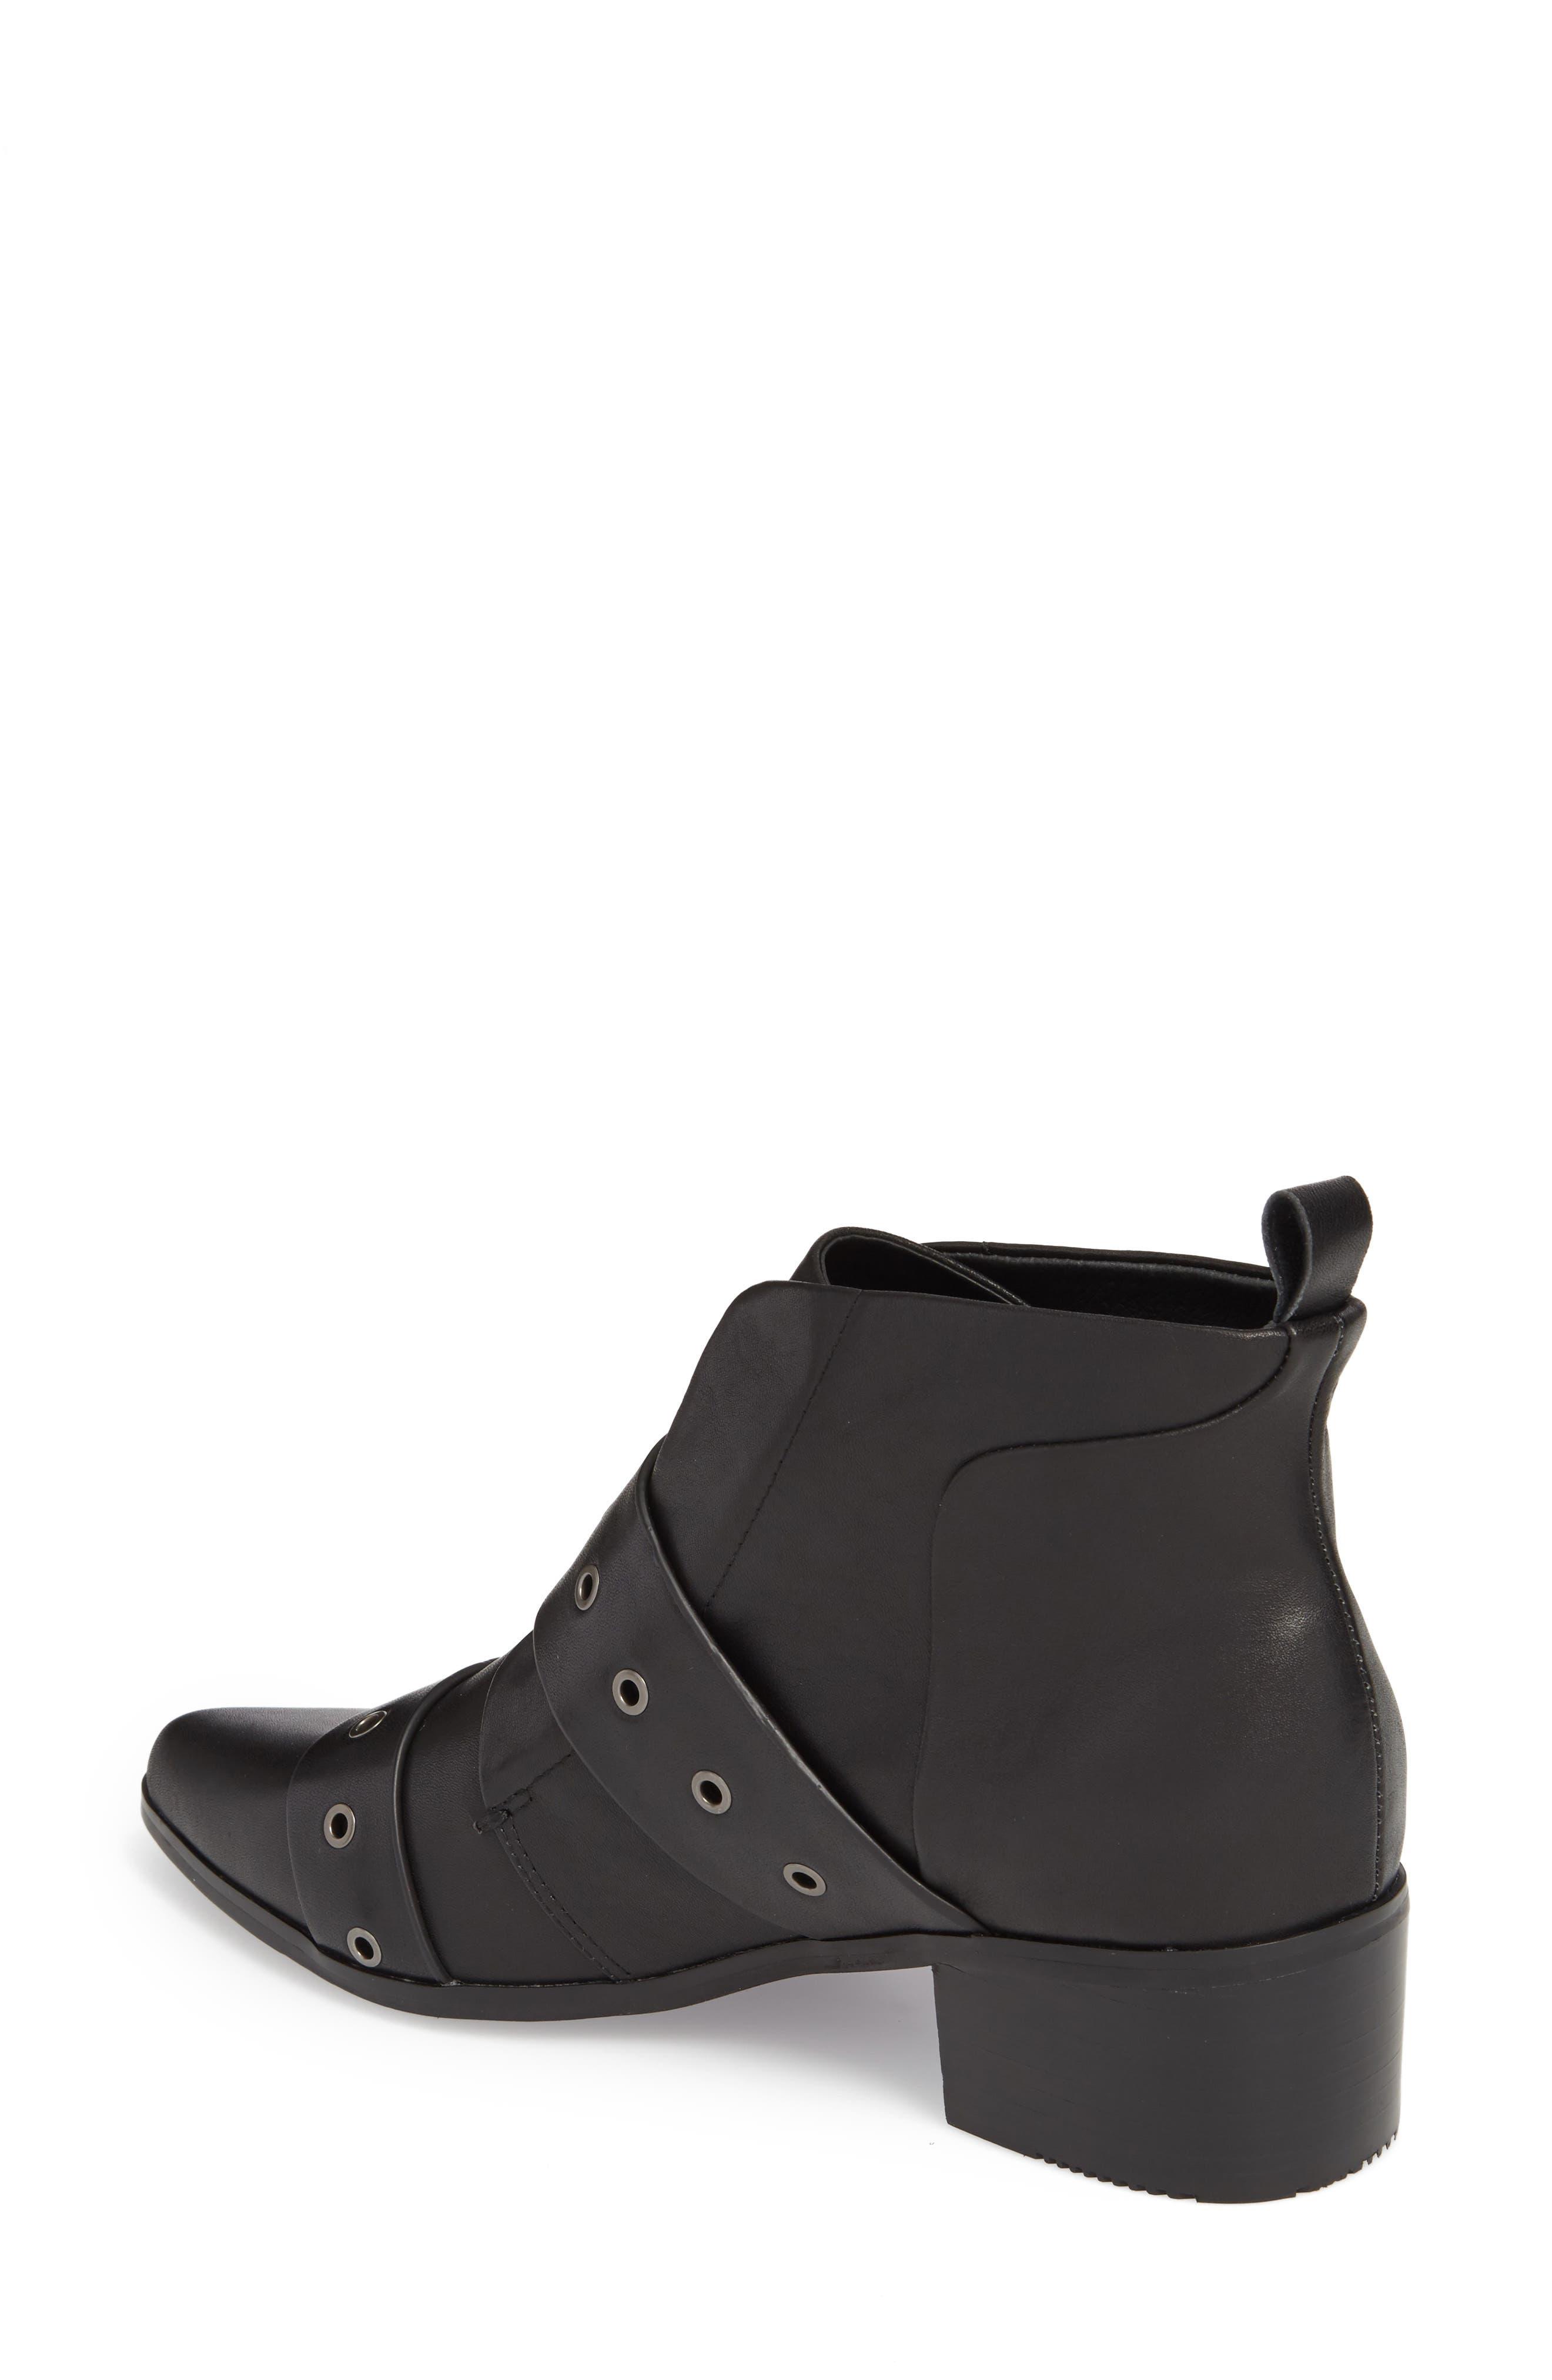 Buckle Strap Bootie,                             Alternate thumbnail 2, color,                             Black Leather